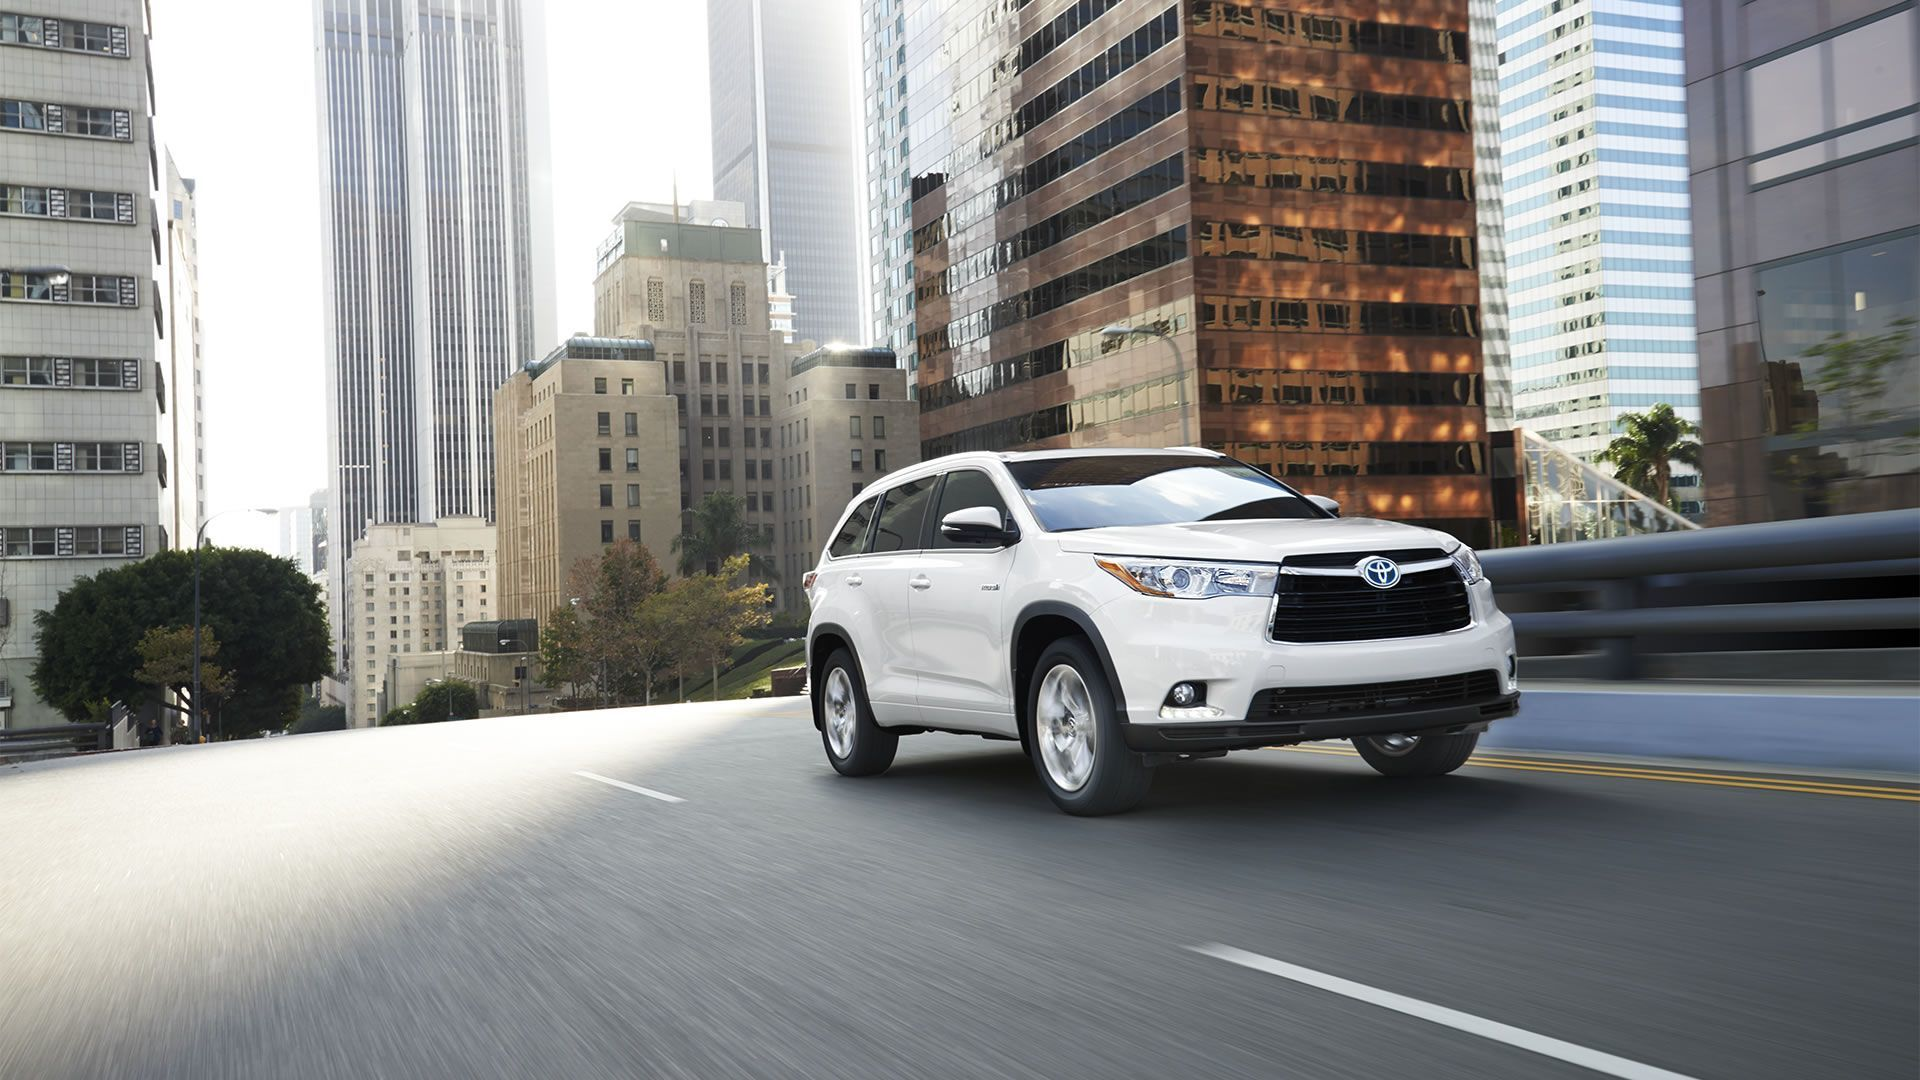 2015 Toyota Highlander Hybrid for Sale near Tacoma at Doxon Toyota